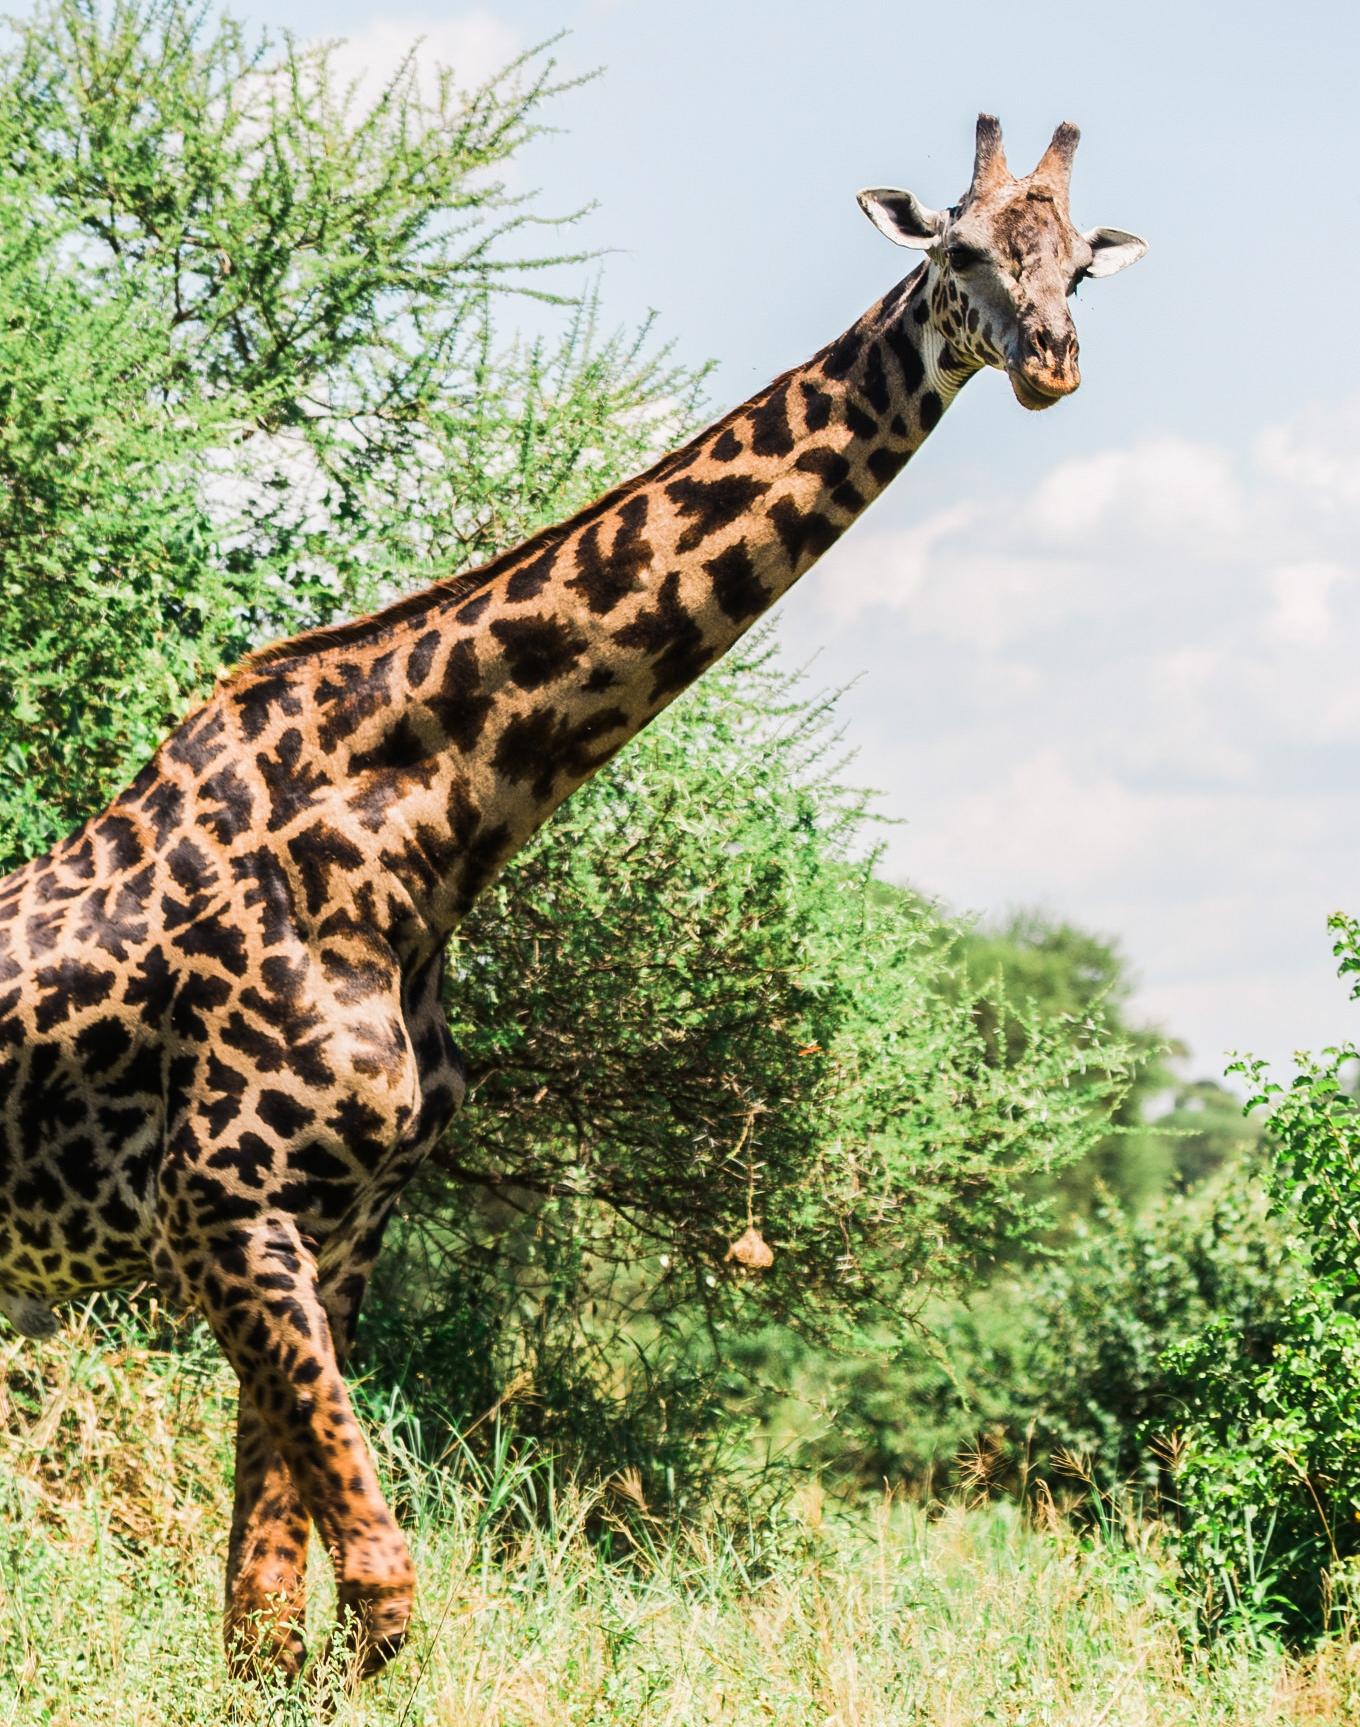 Old male giraffe in Maasai Mara, Kenya Ph. Valorie Darling